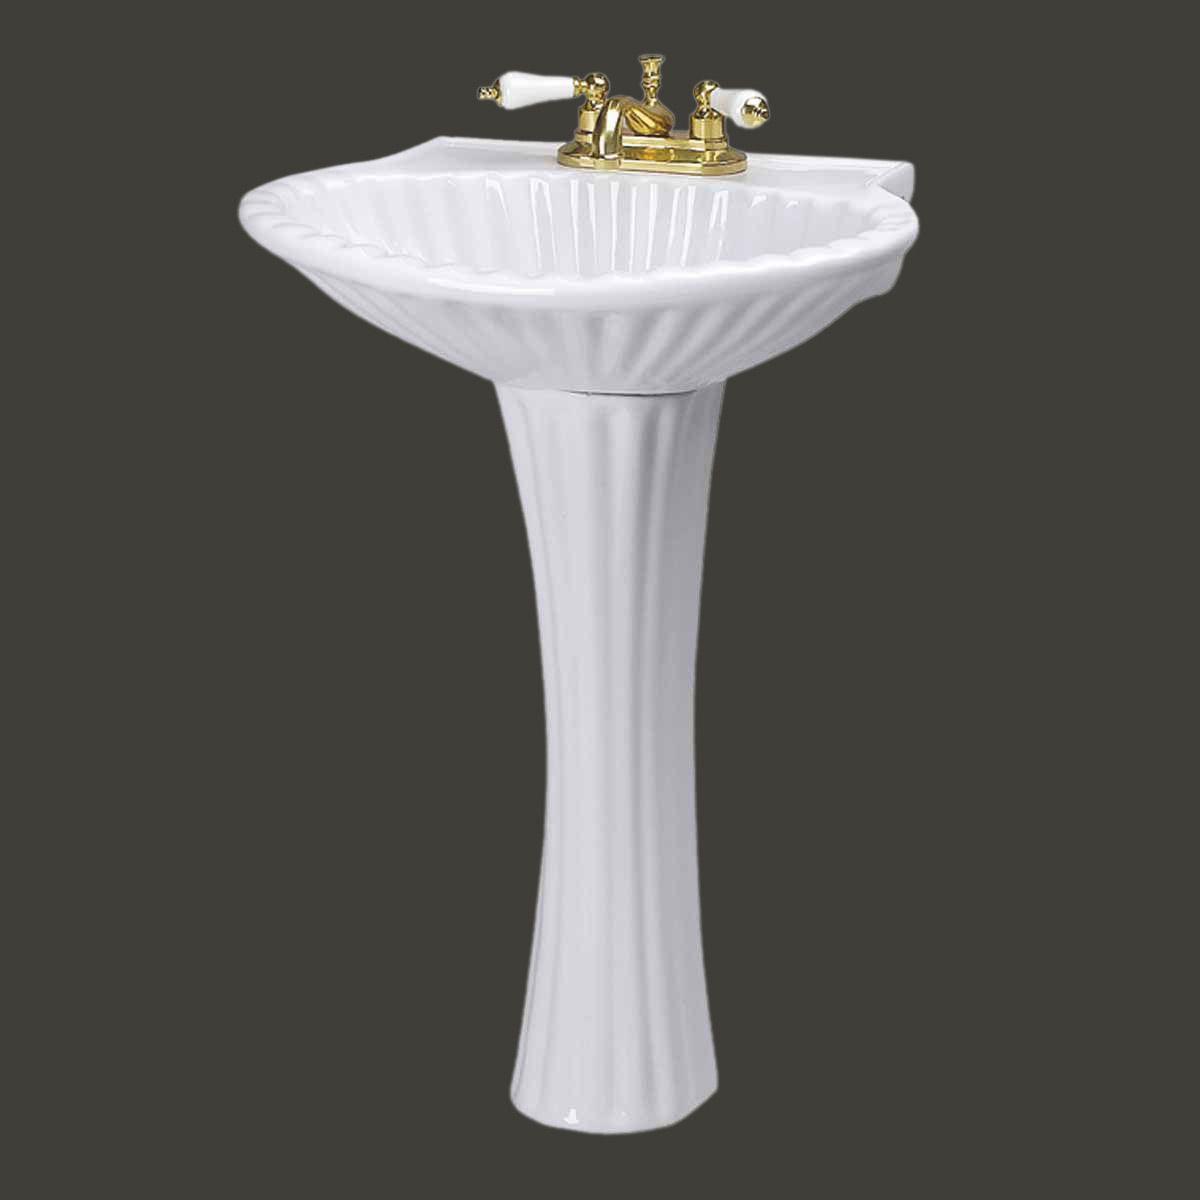 Awesome Bathroom Pedestal Sink White China Sea Shell